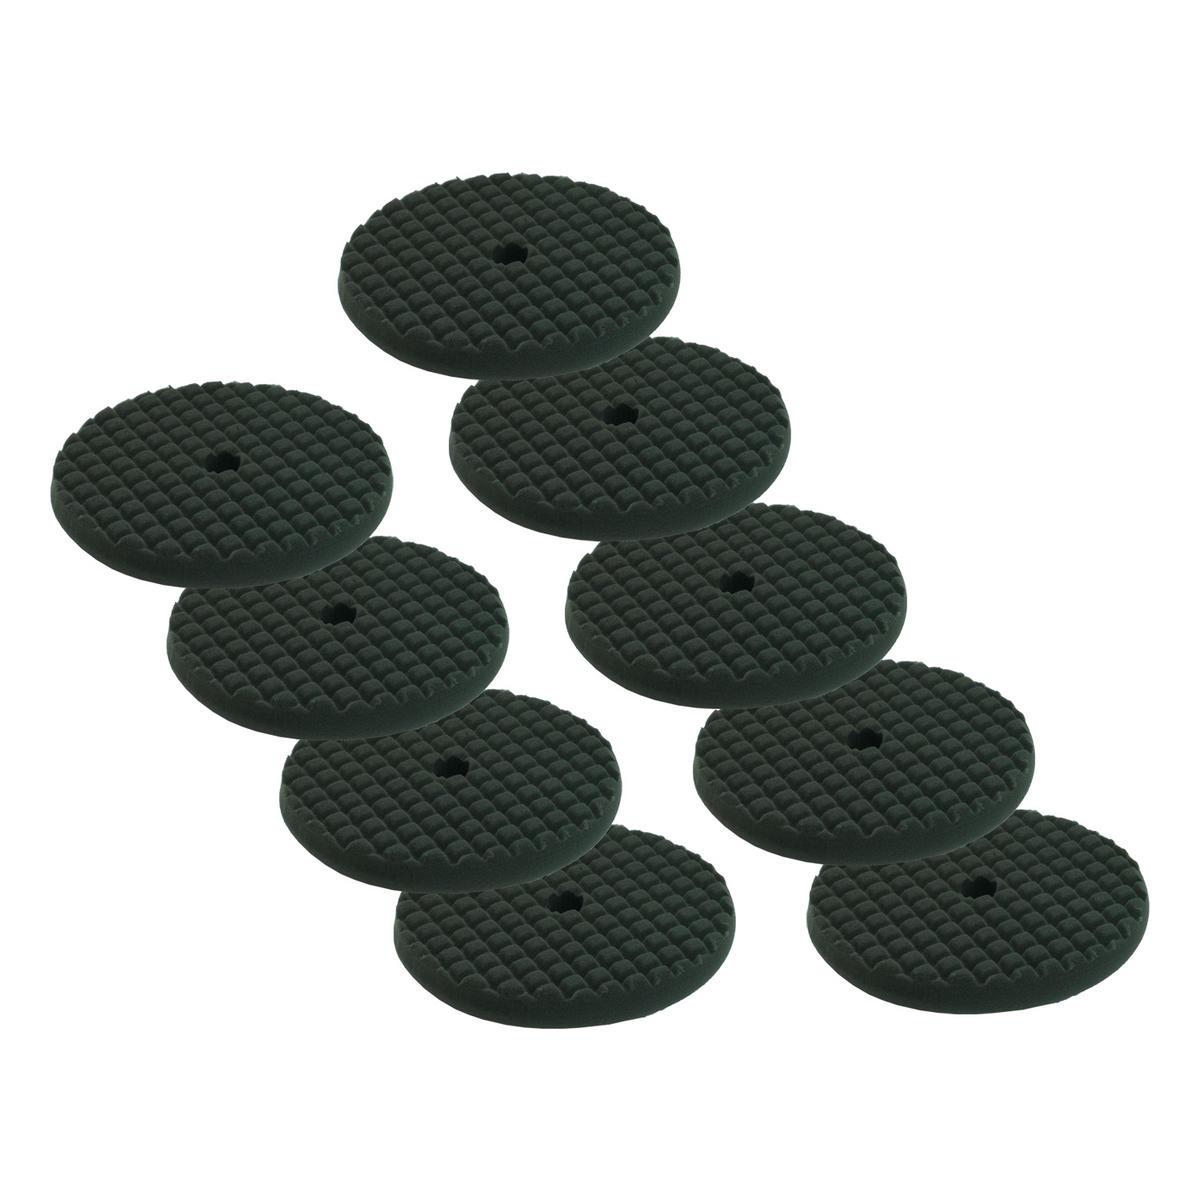 Car Cleaning 200mm Soft Black Waffle Polishing Cutting Detailing Mop Head x 9